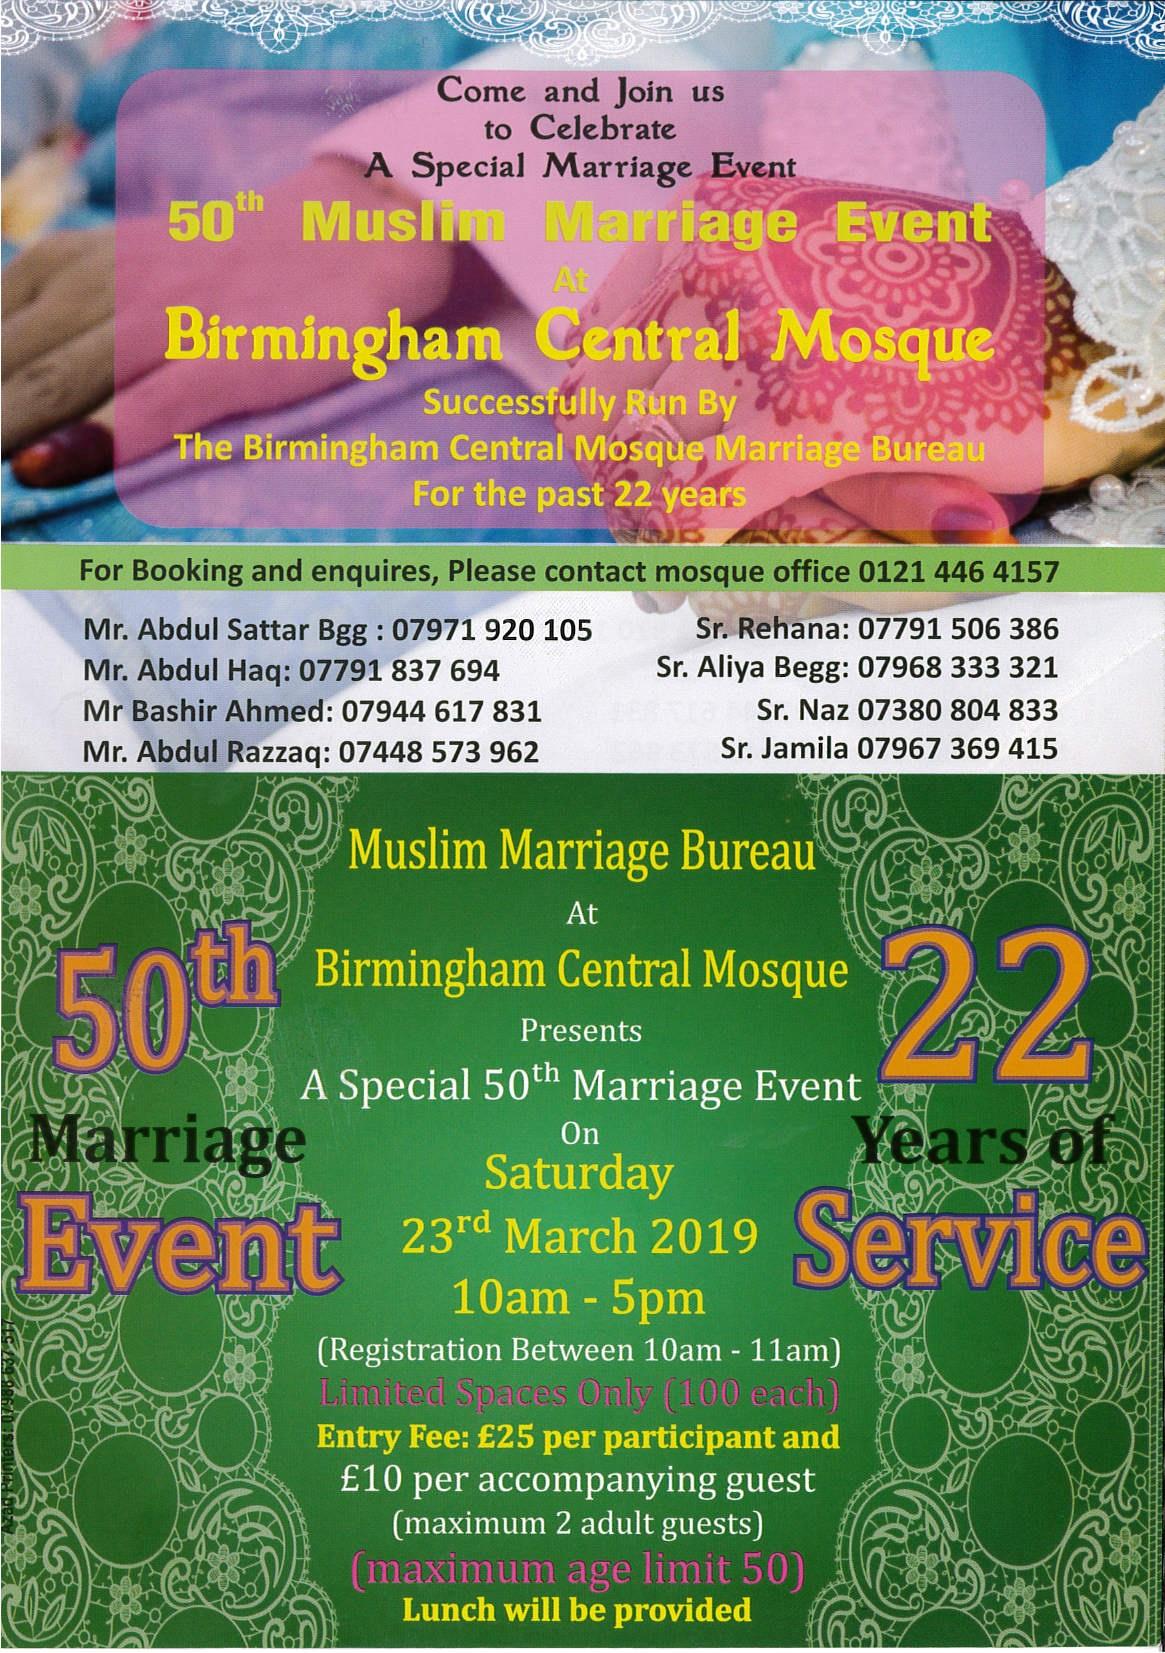 Muslim marriage bureau uk  The Muslim Matchmakers UK  2019-05-01